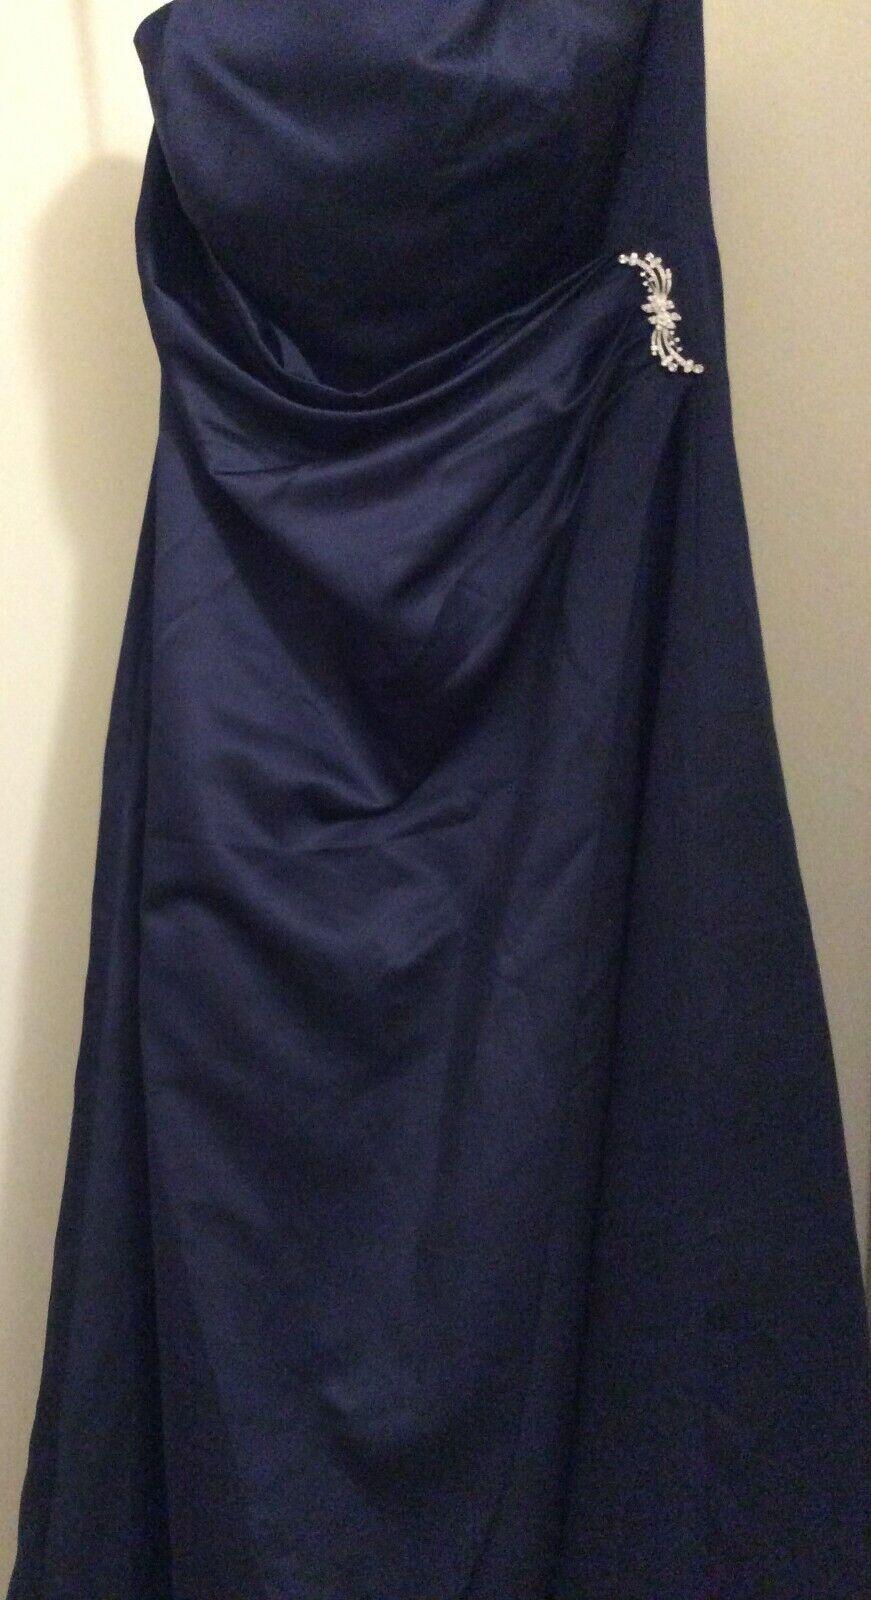 David's Bridal Dark Blue Strapless Formal Evening Gown Dress, Size 14